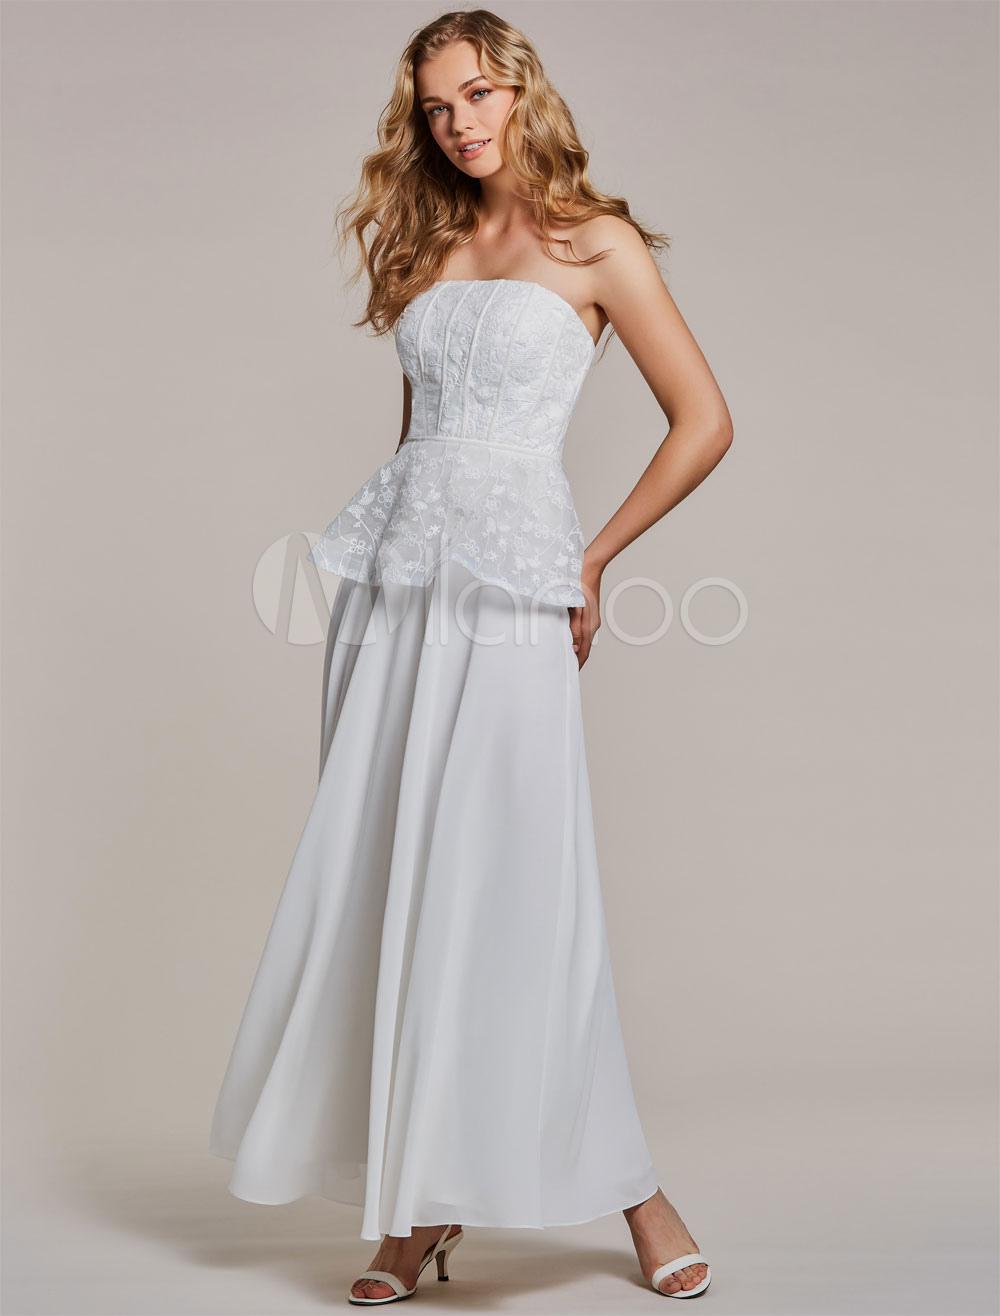 White Prom Dresses Lace Peplum Strapless Chiffon Ankle Length Formal Dress (Wedding Cheap Party Dress) photo